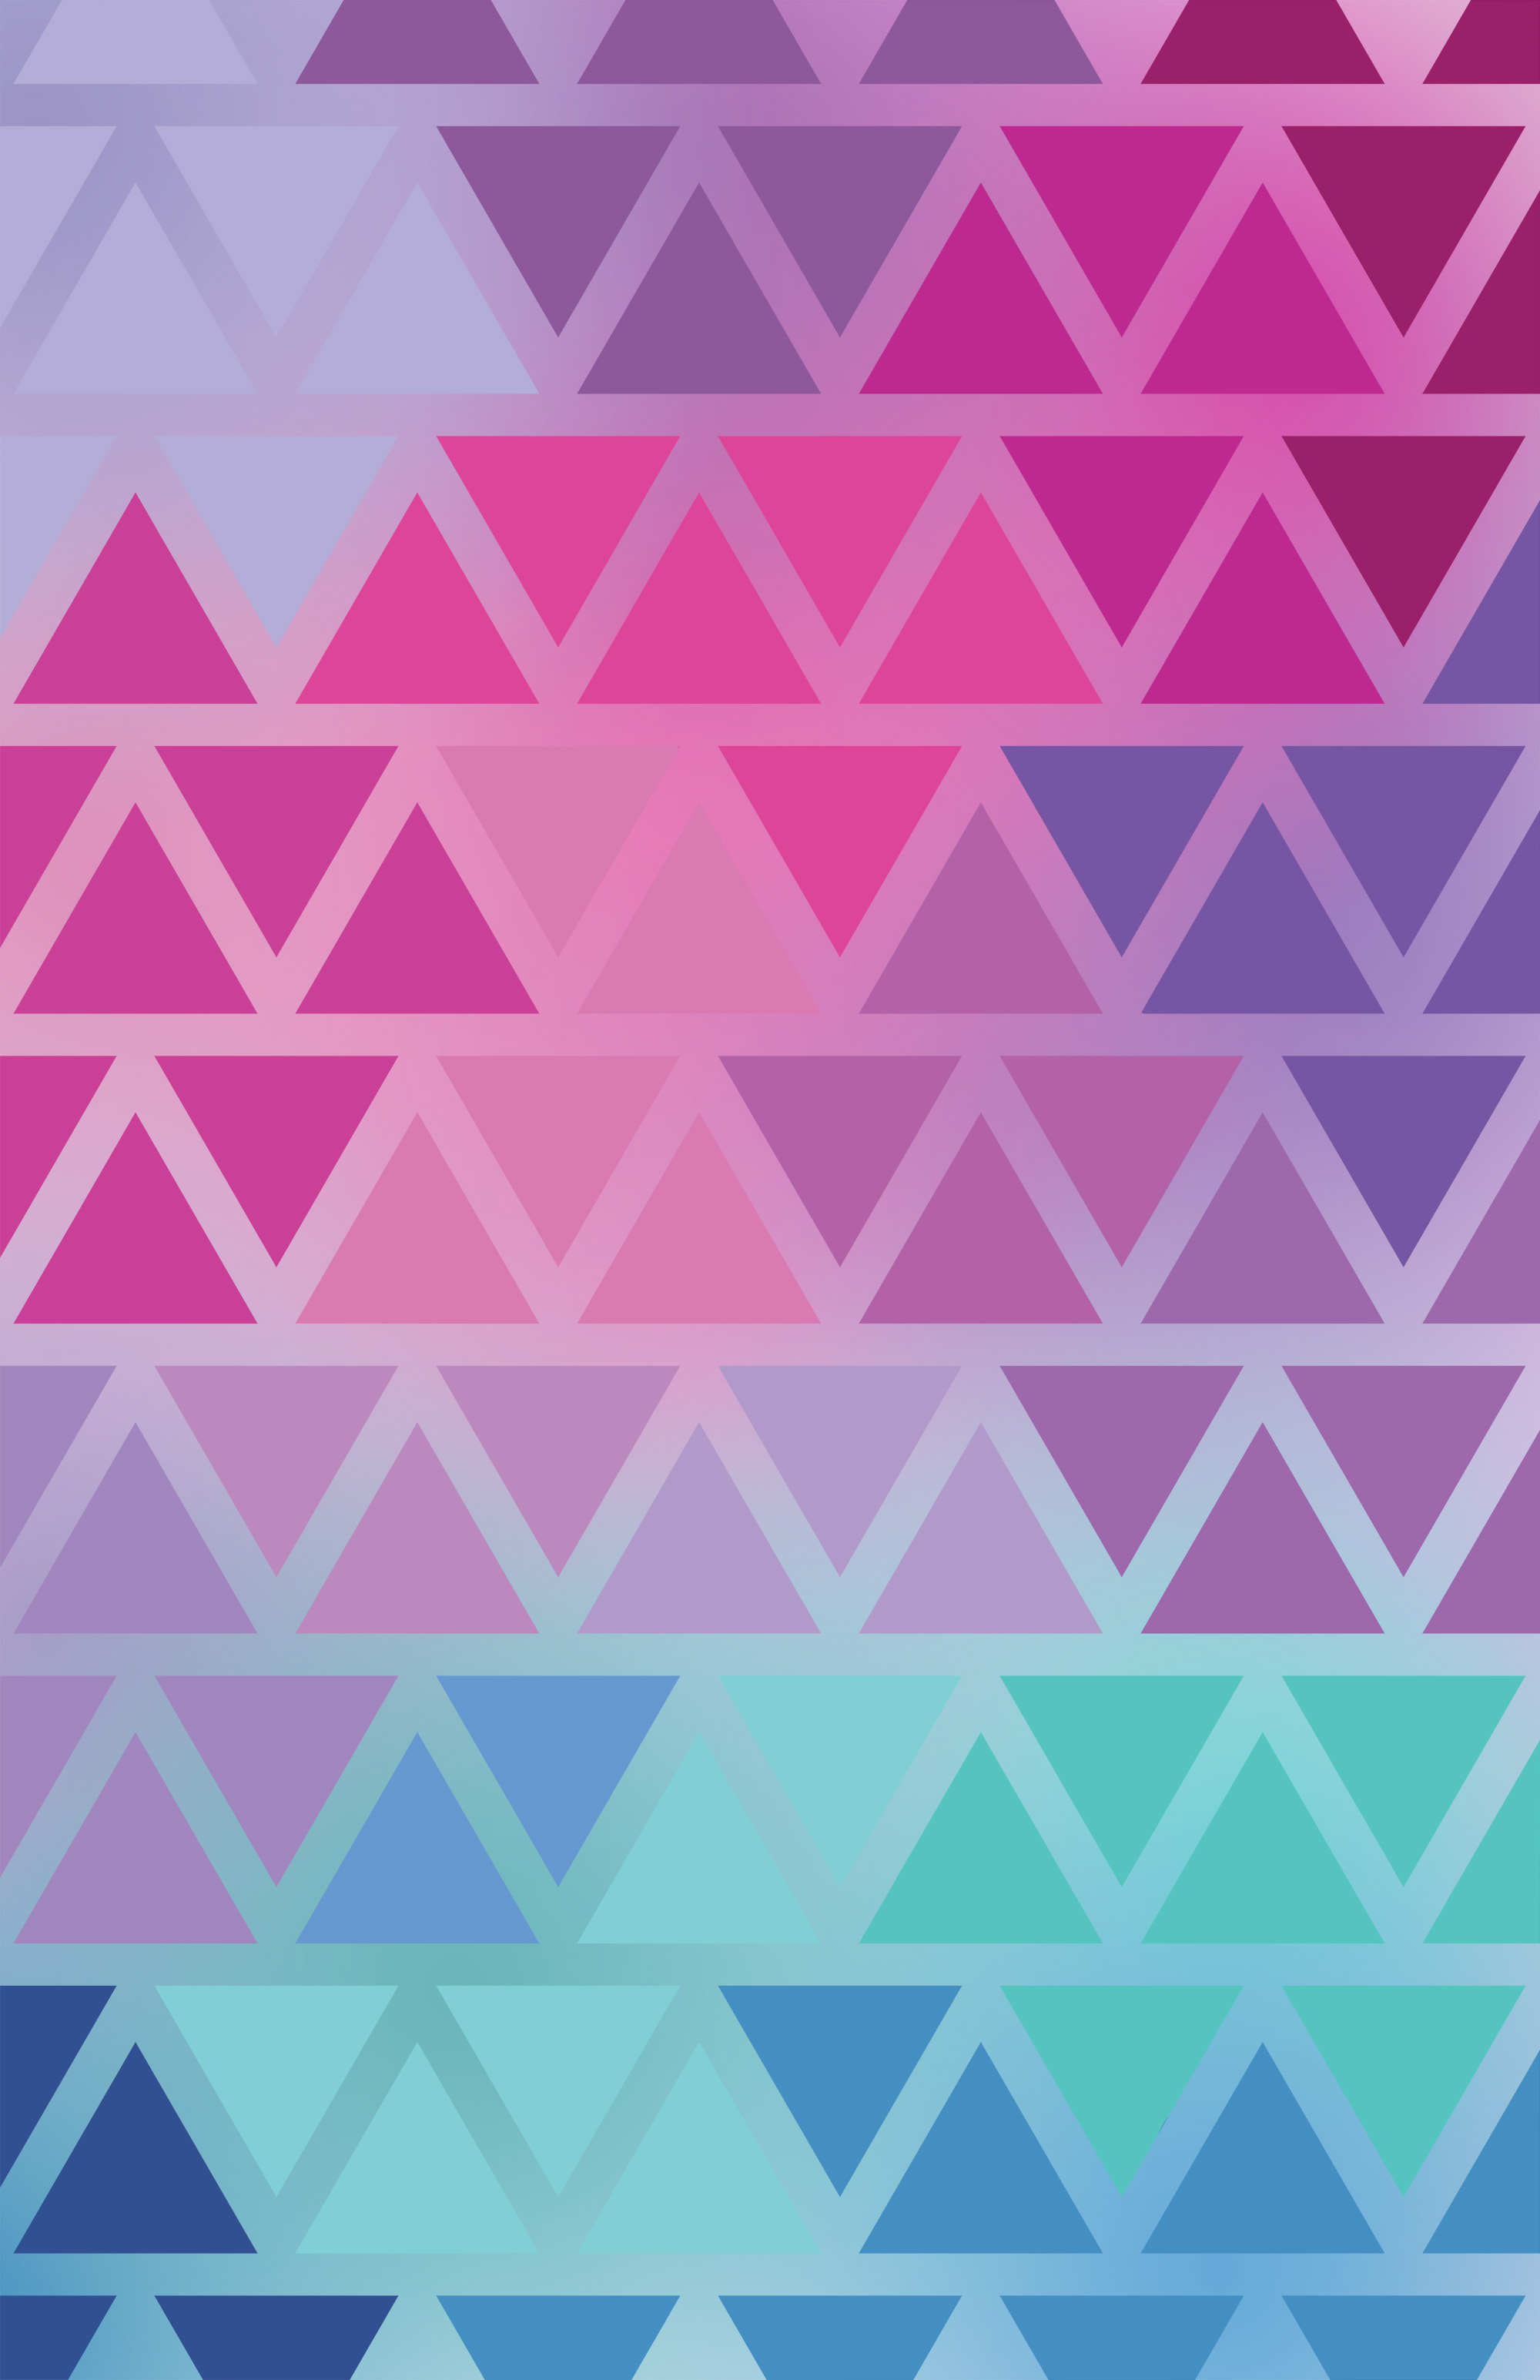 0302_sofar_sounds_santamonica-websized-triangles.jpg